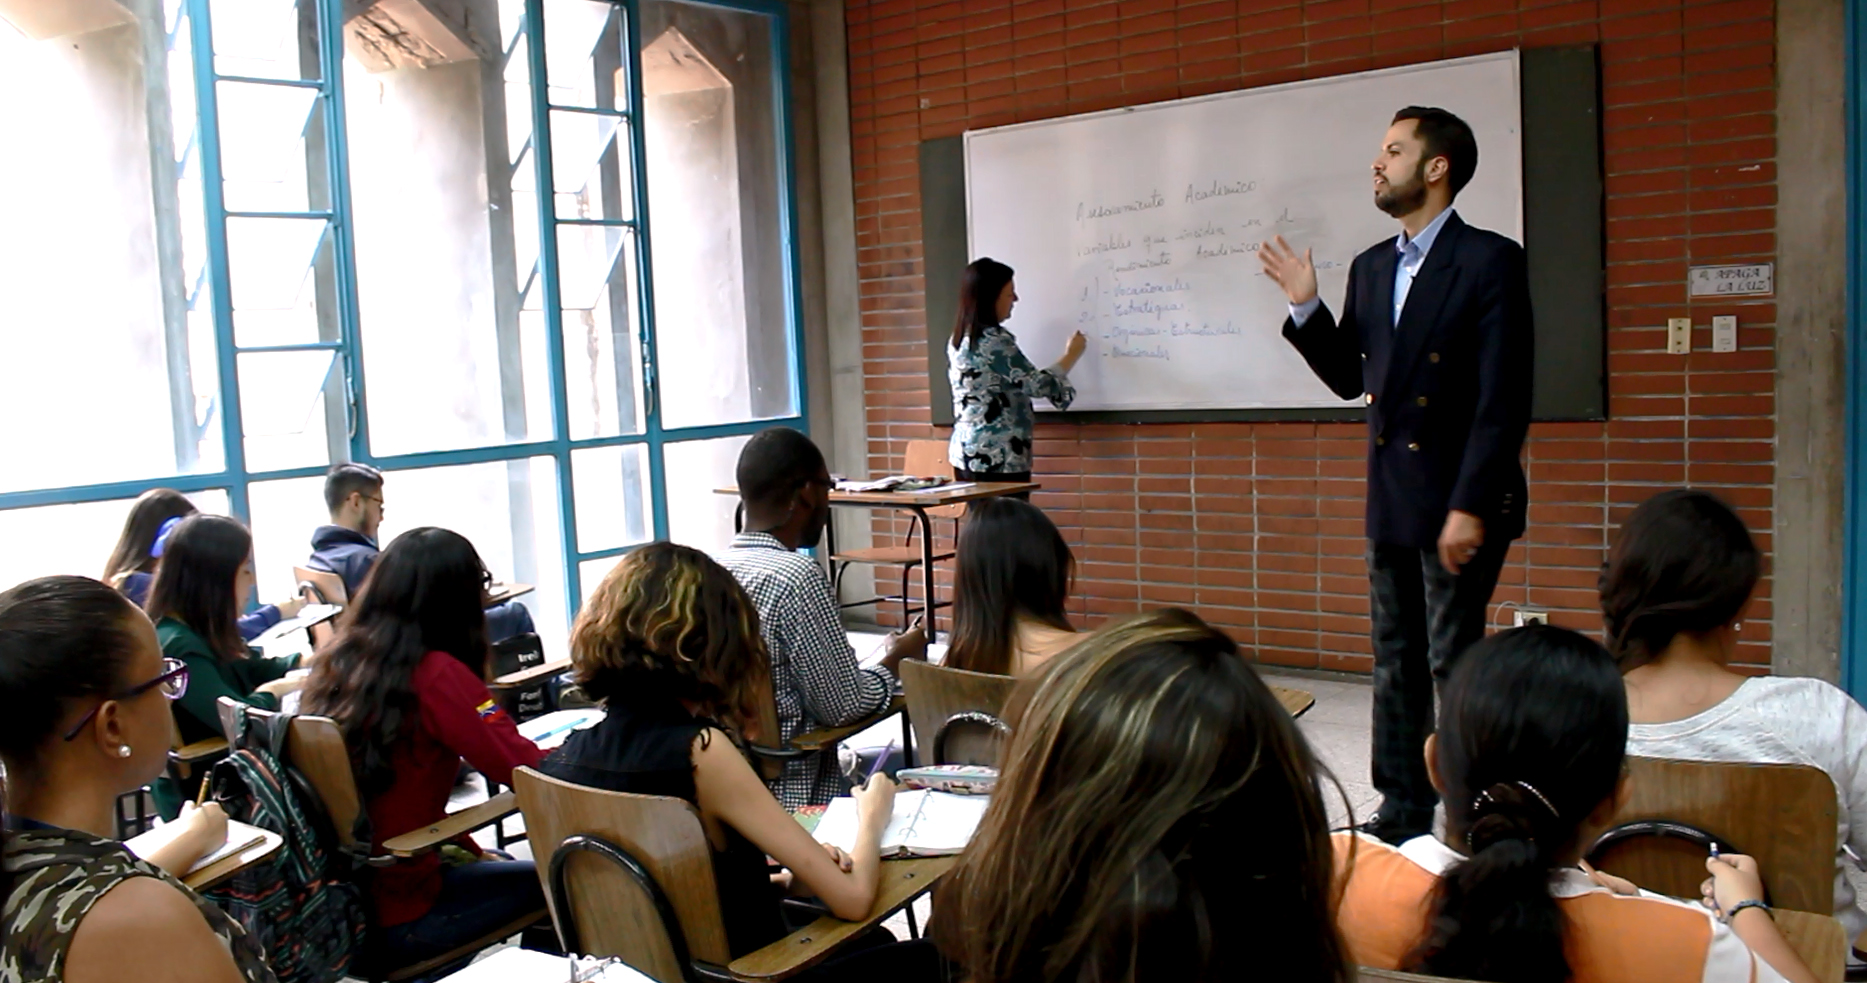 Comenzó censo vocacional para interesados en becas Educa 20-20